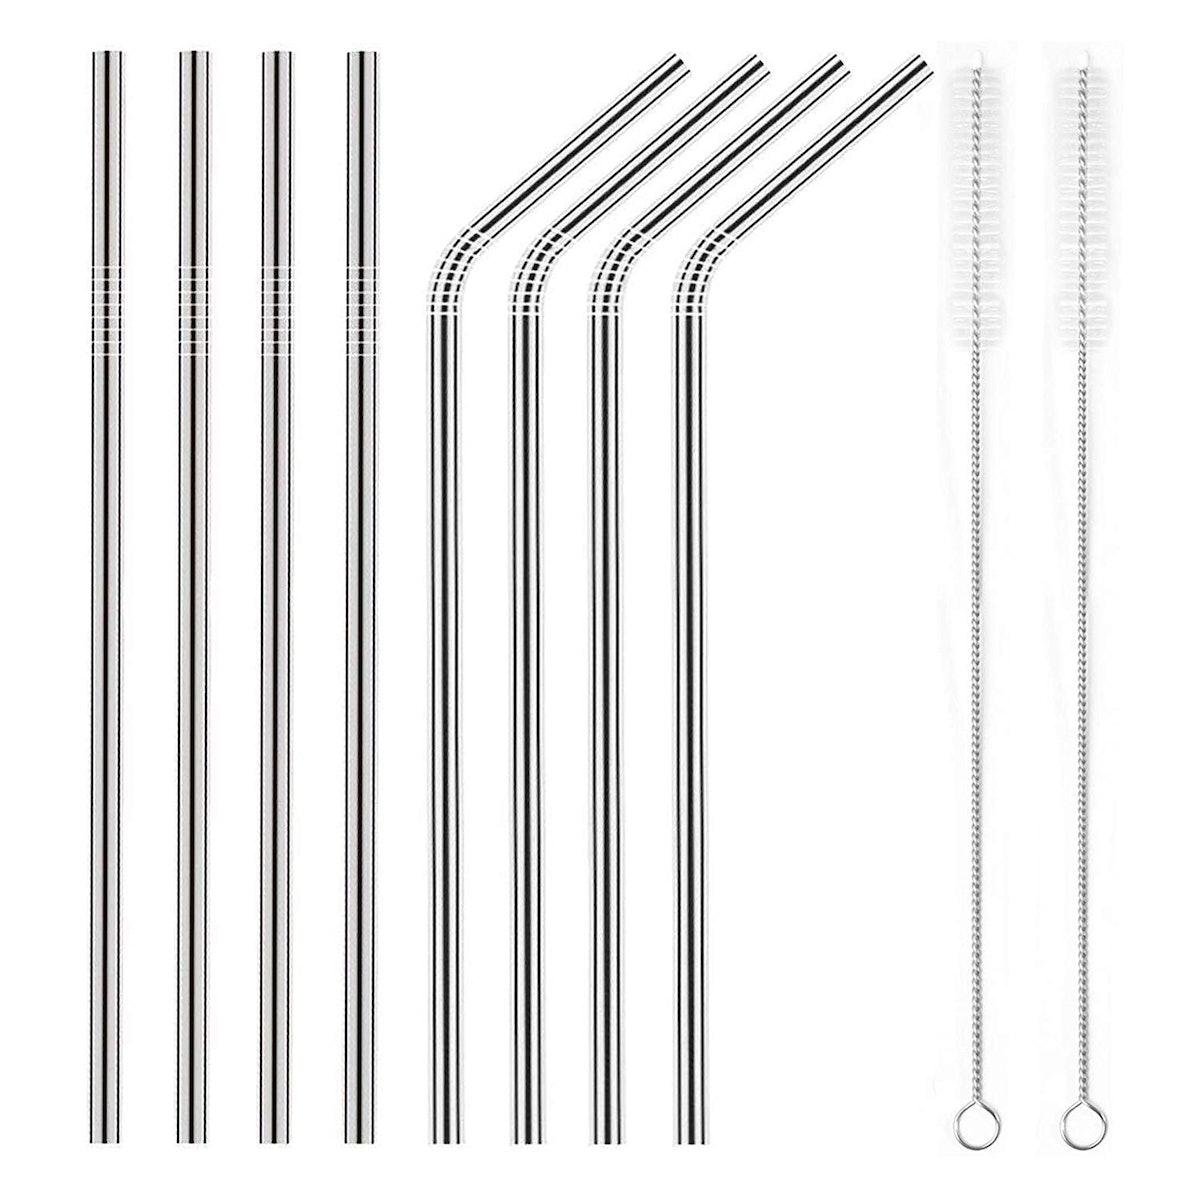 Yihong Stainless Steel Metal Straws